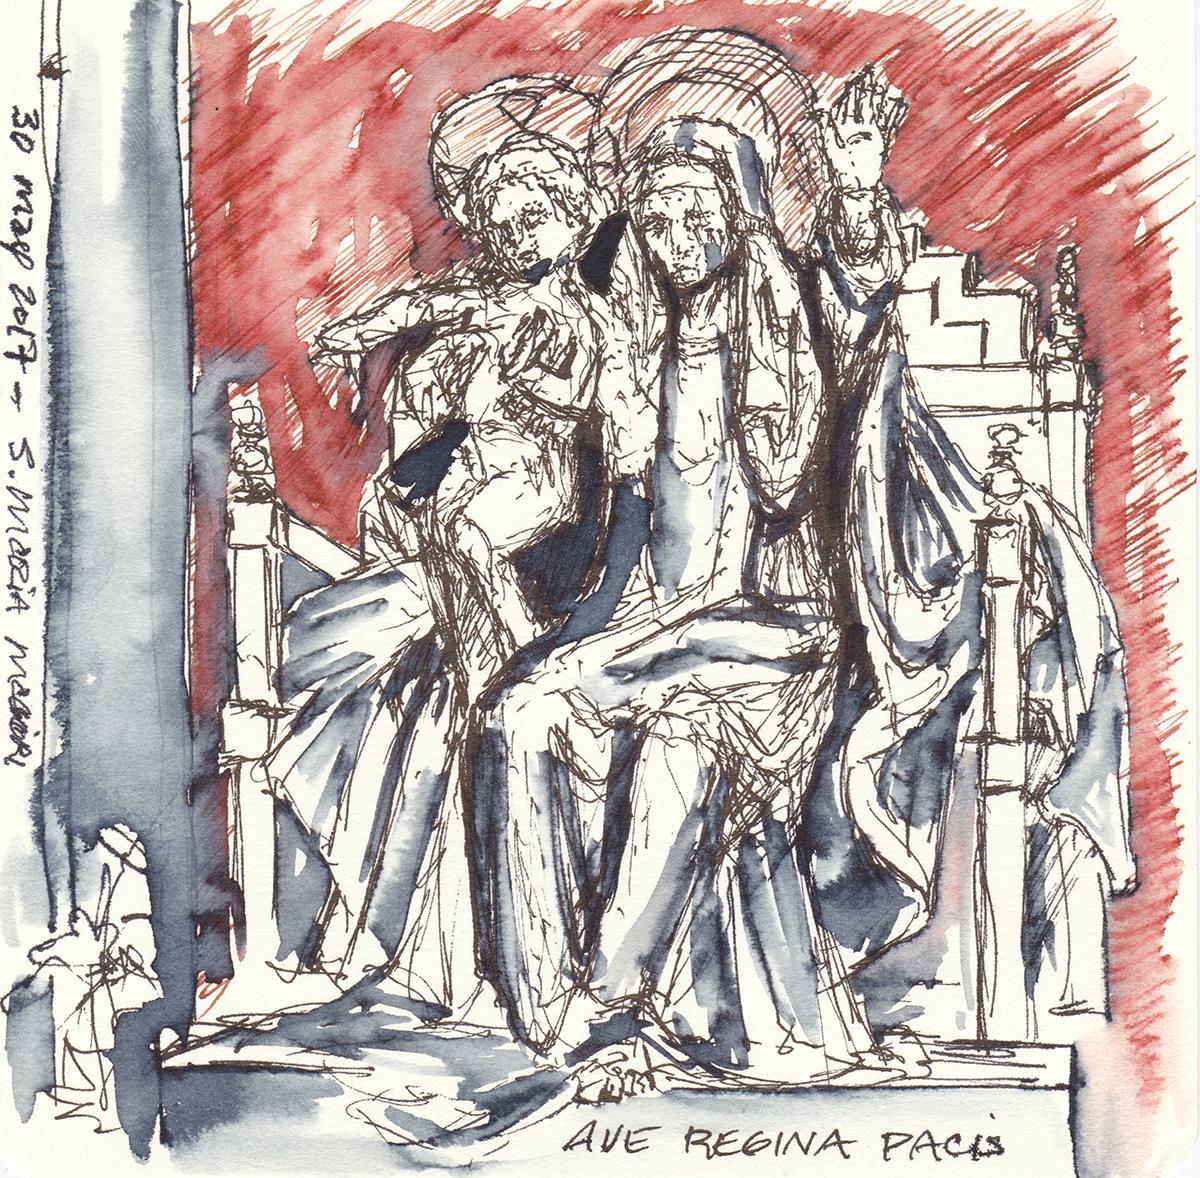 Ave Regina Pacis in Santa Maria Maggiore, Rome, Itay Ink on paper, 5.5 x 5.5 inches, 2017